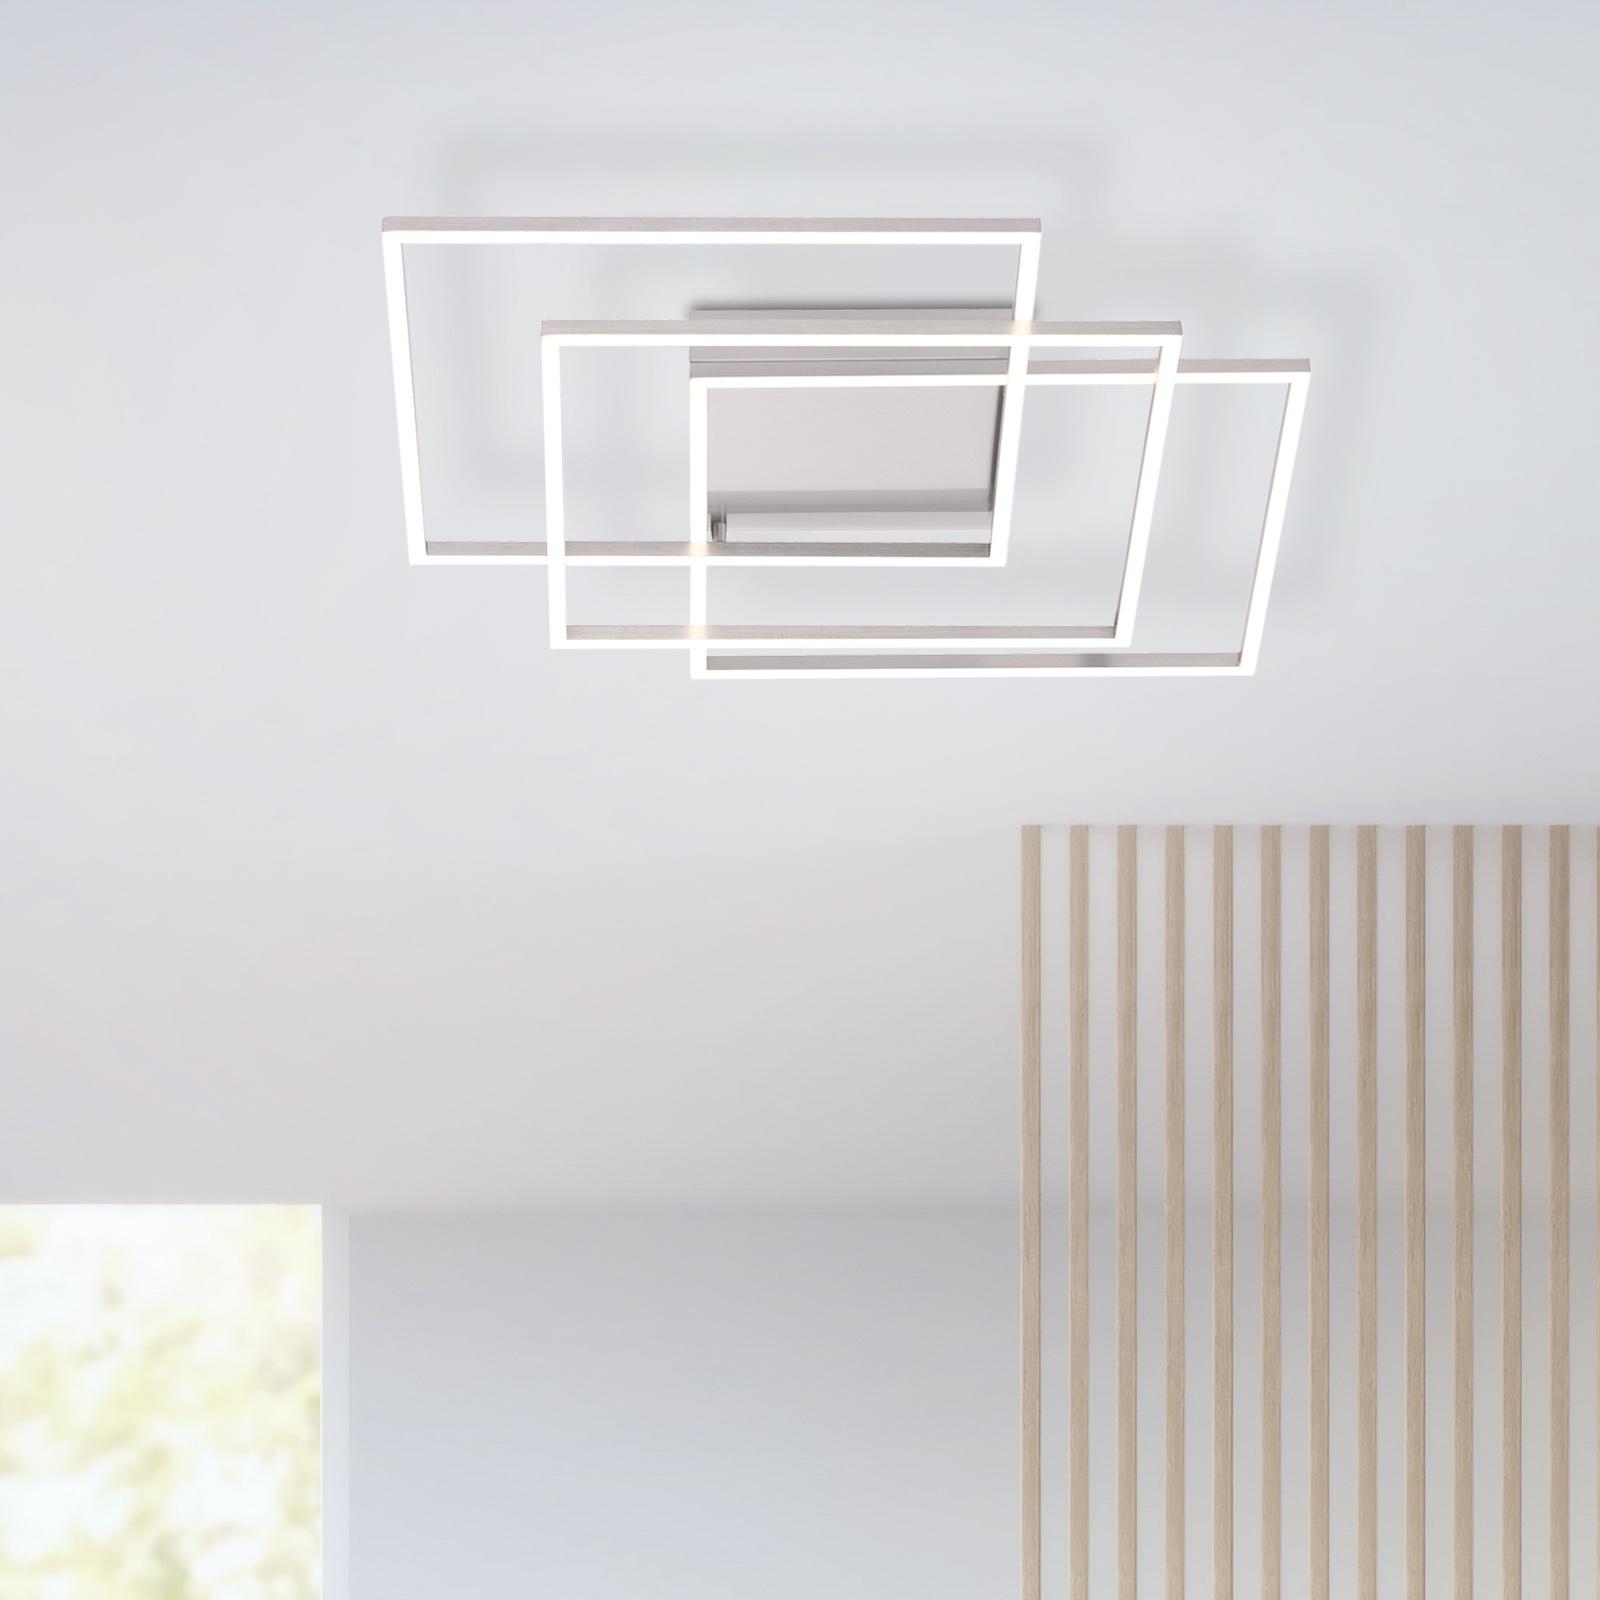 Plafonnier LED Q-Inigo compatible Smart-Home 60 cm